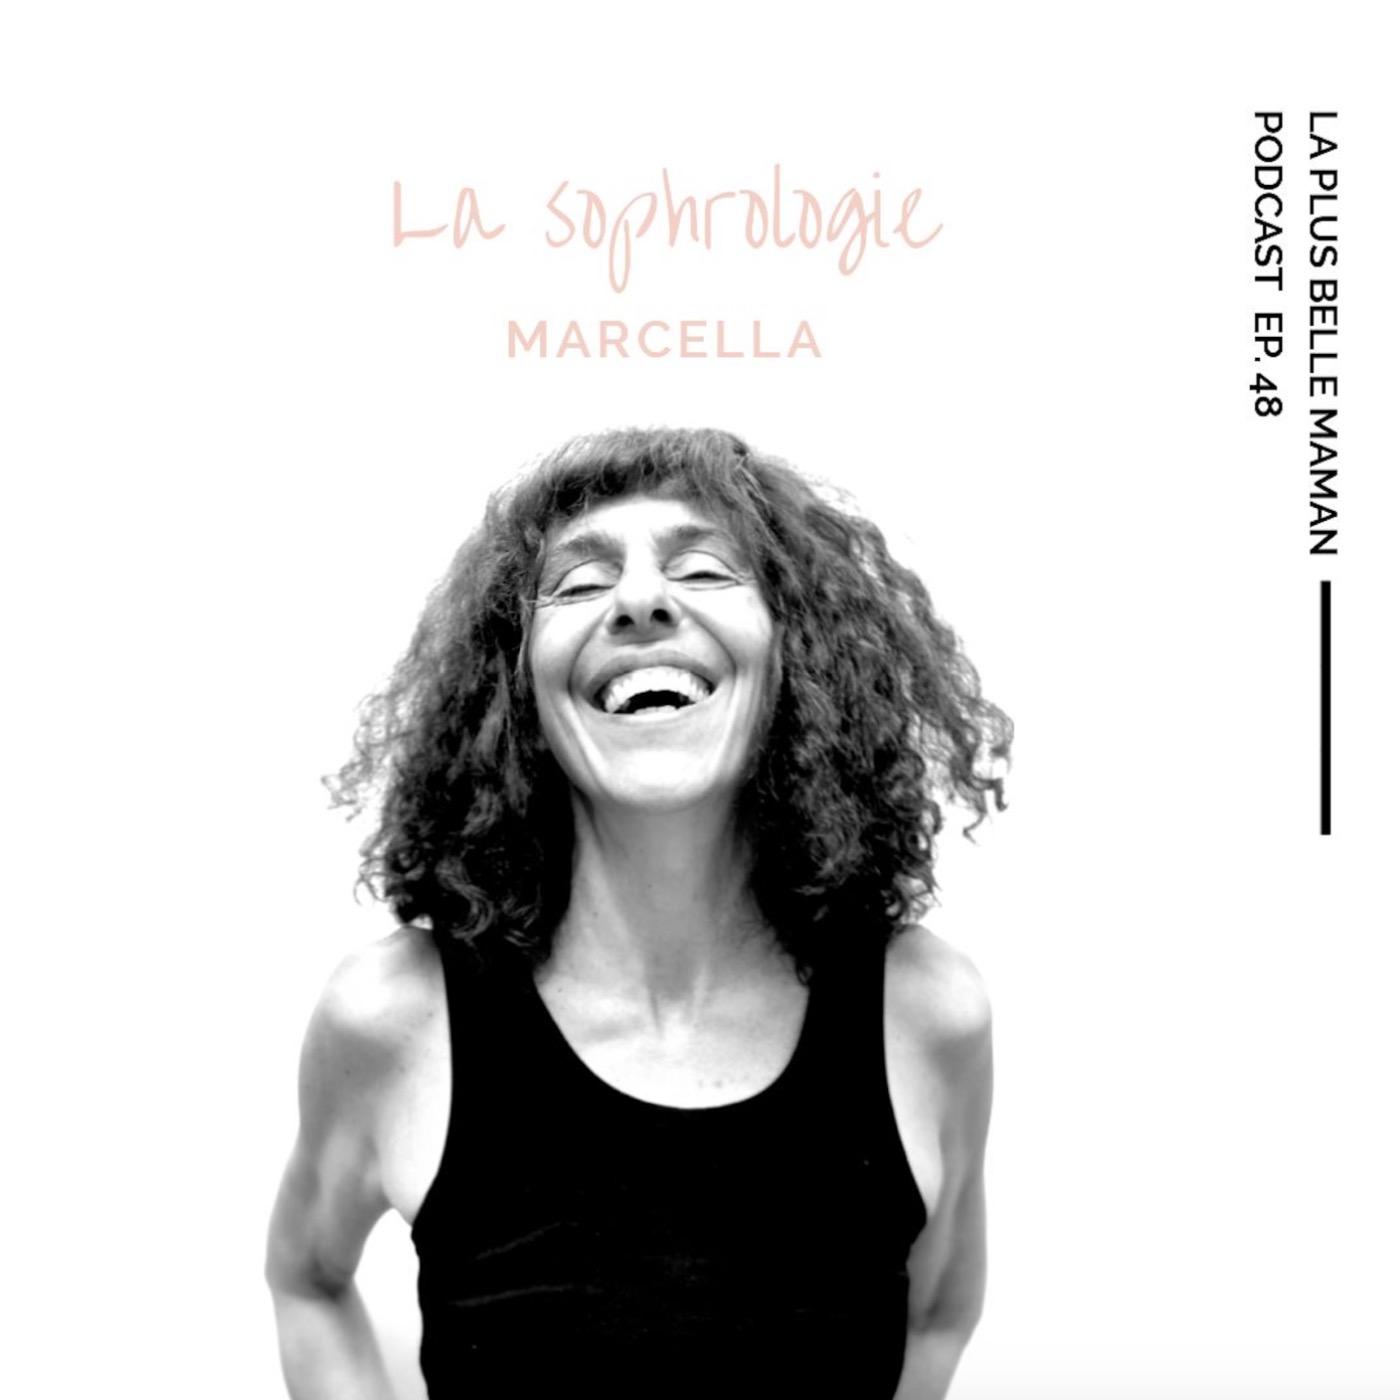 La sophrologie avec Marcella